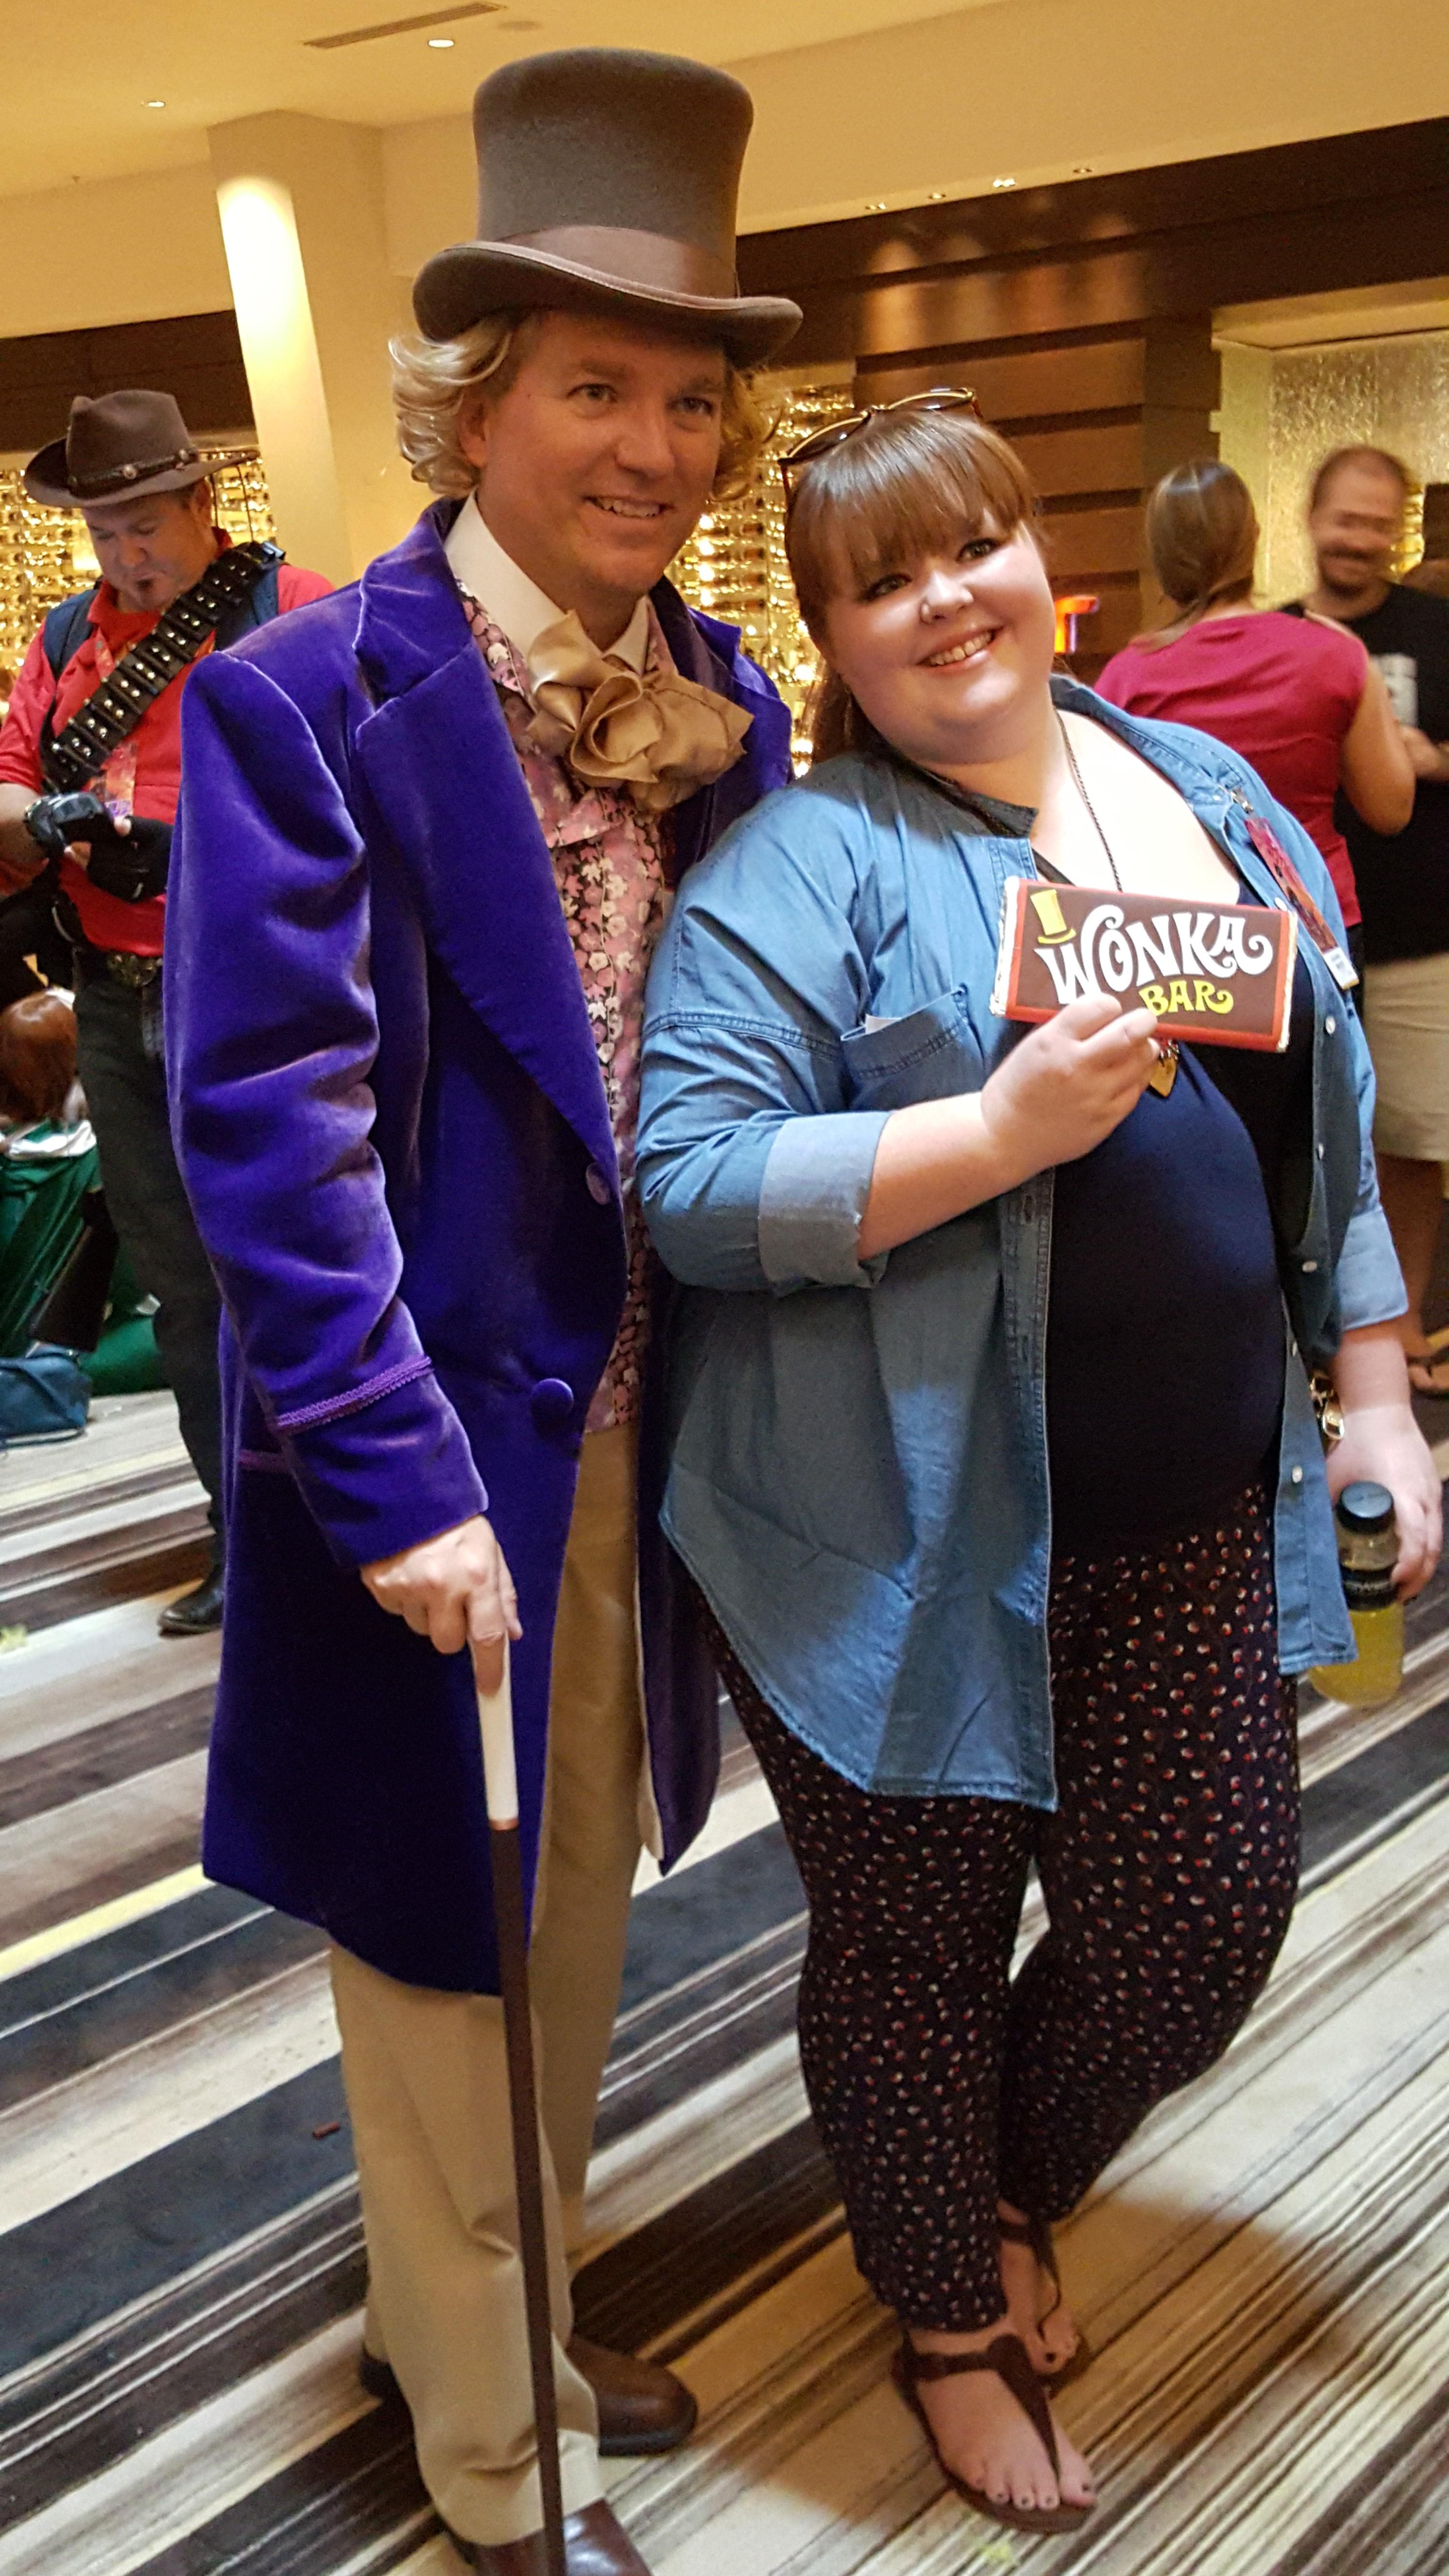 Me Posing With A Fan I Gave Her My Handmade Wonka Chocolate